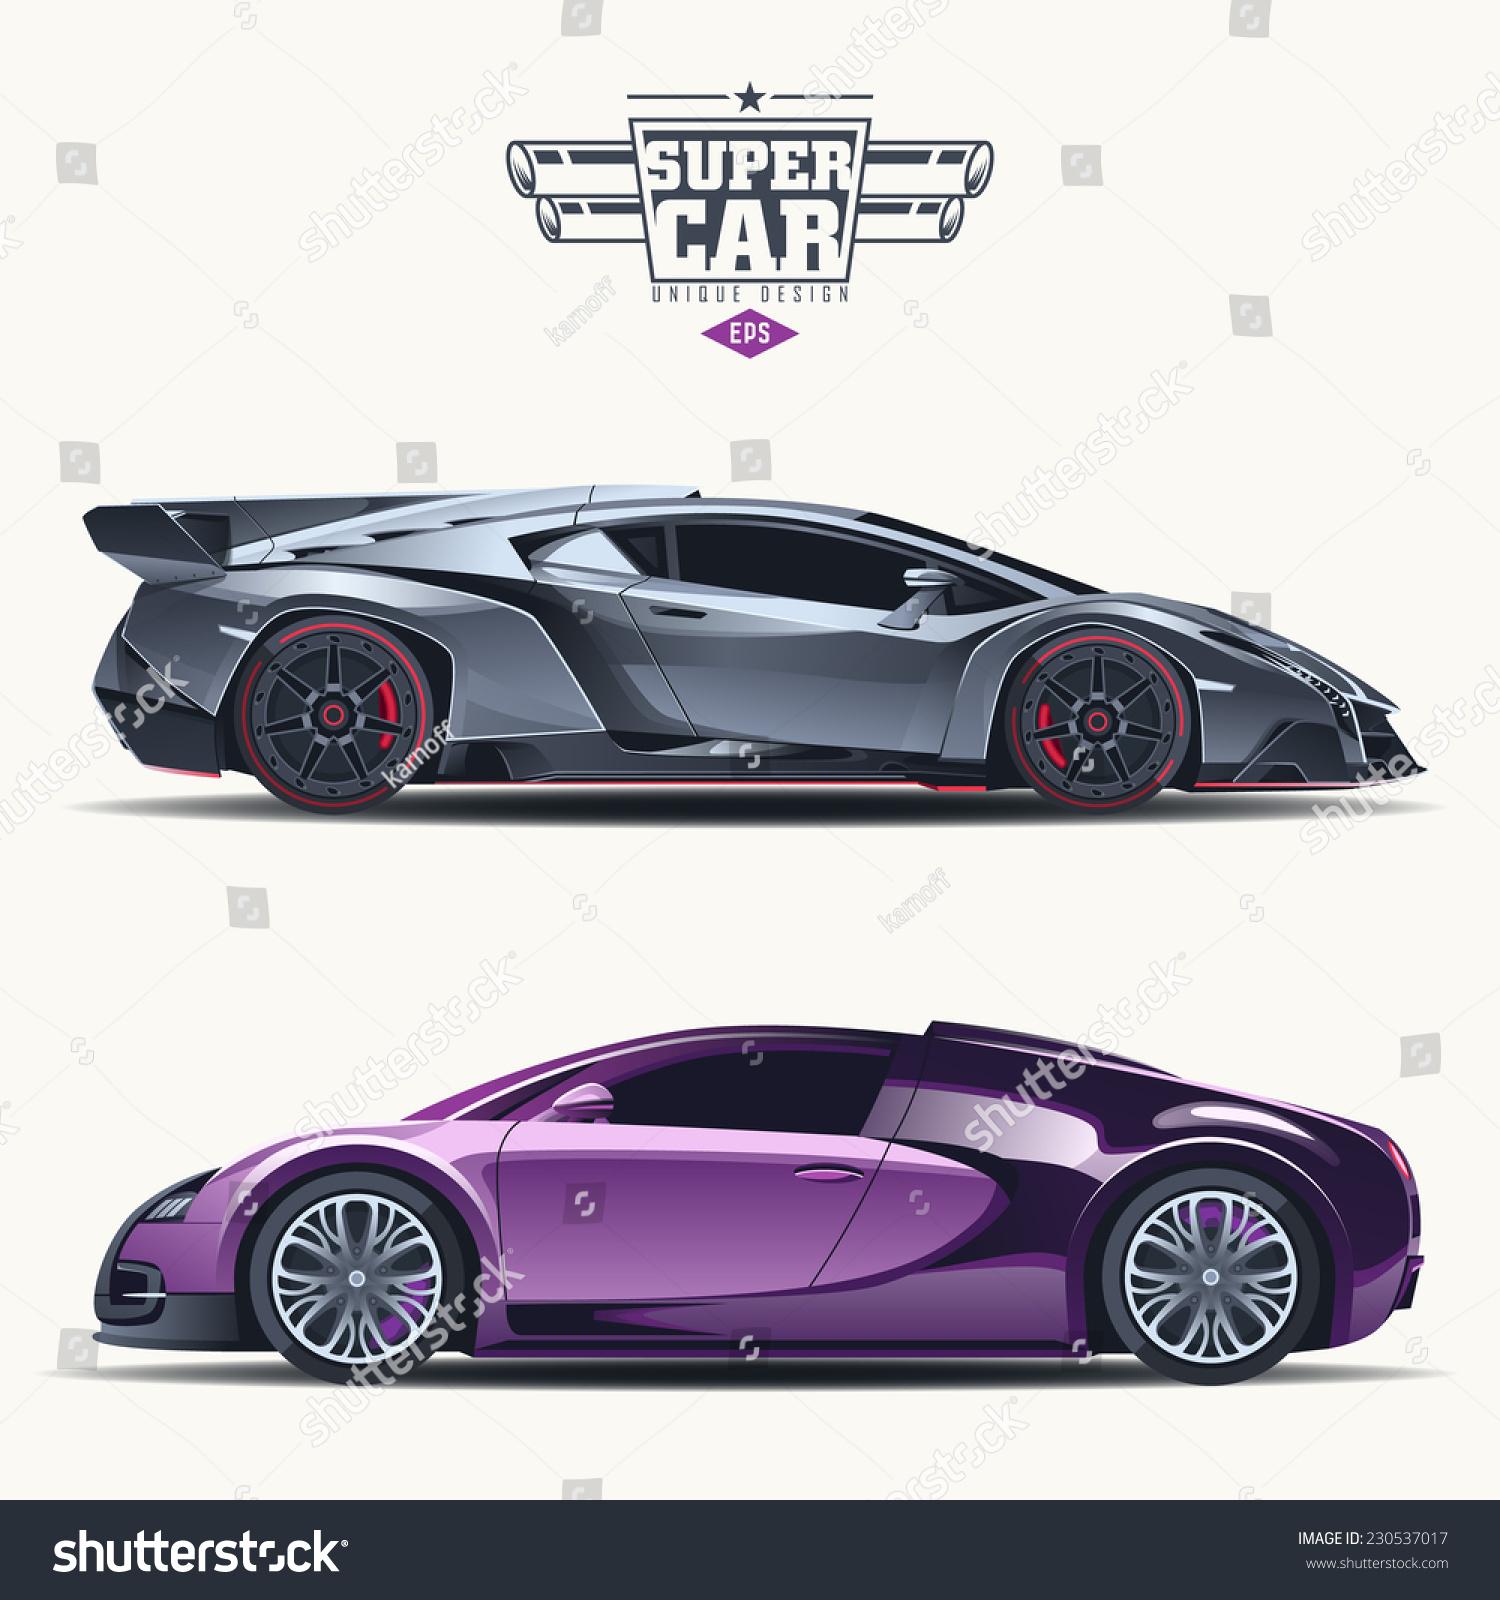 vetor stock de super car design concept unique modern livre de